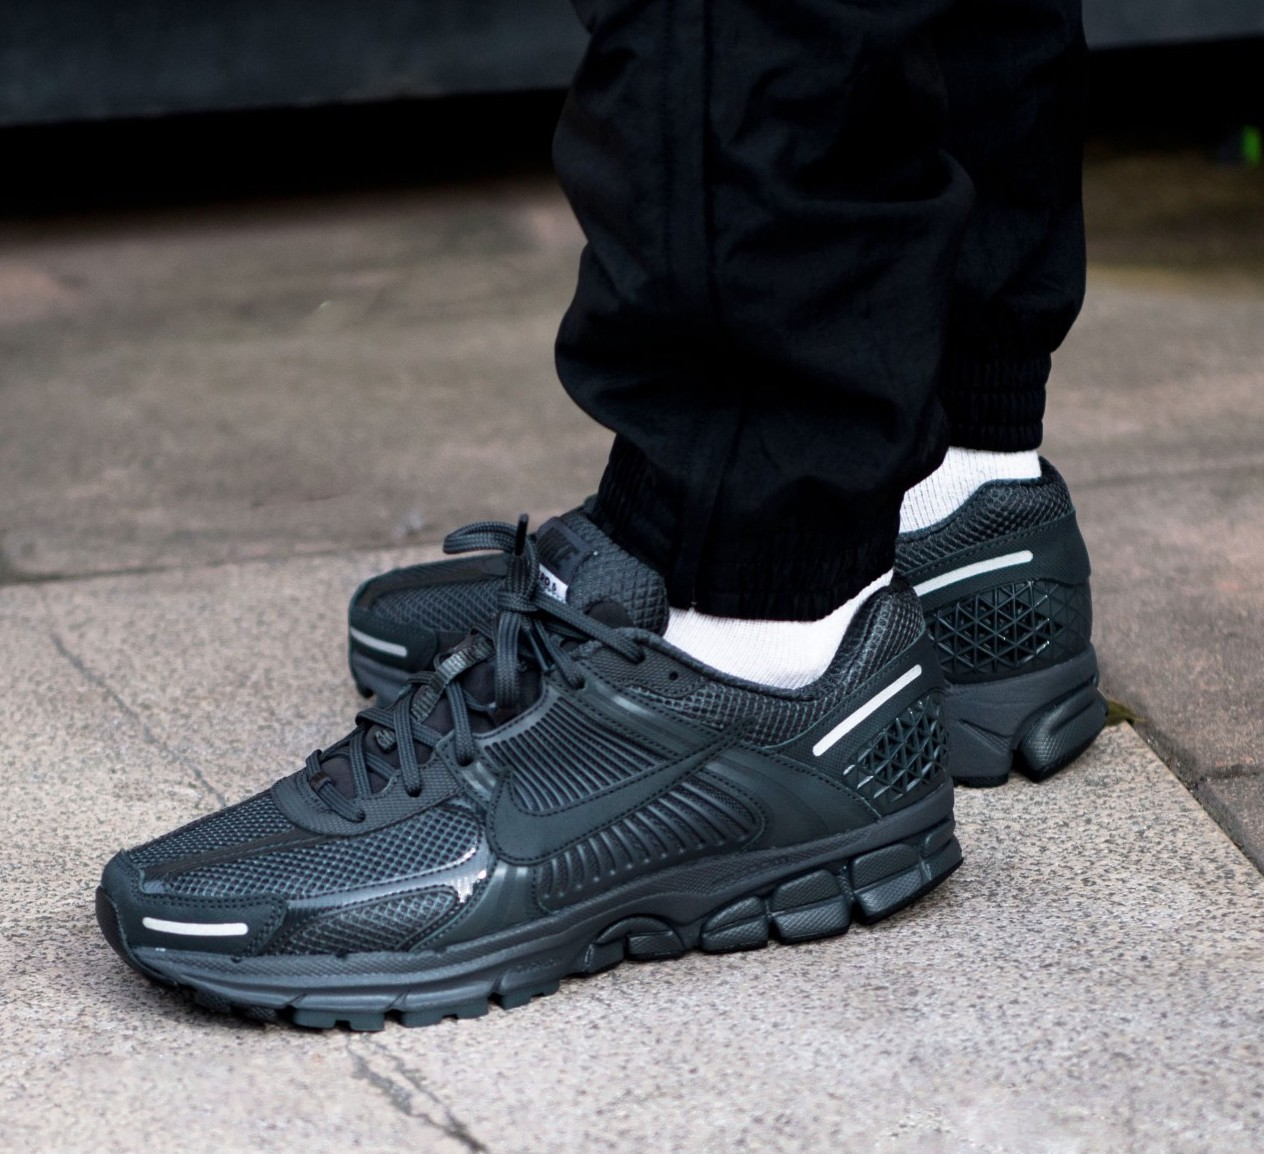 On Sale: Nike Zoom Vomero 5 SP